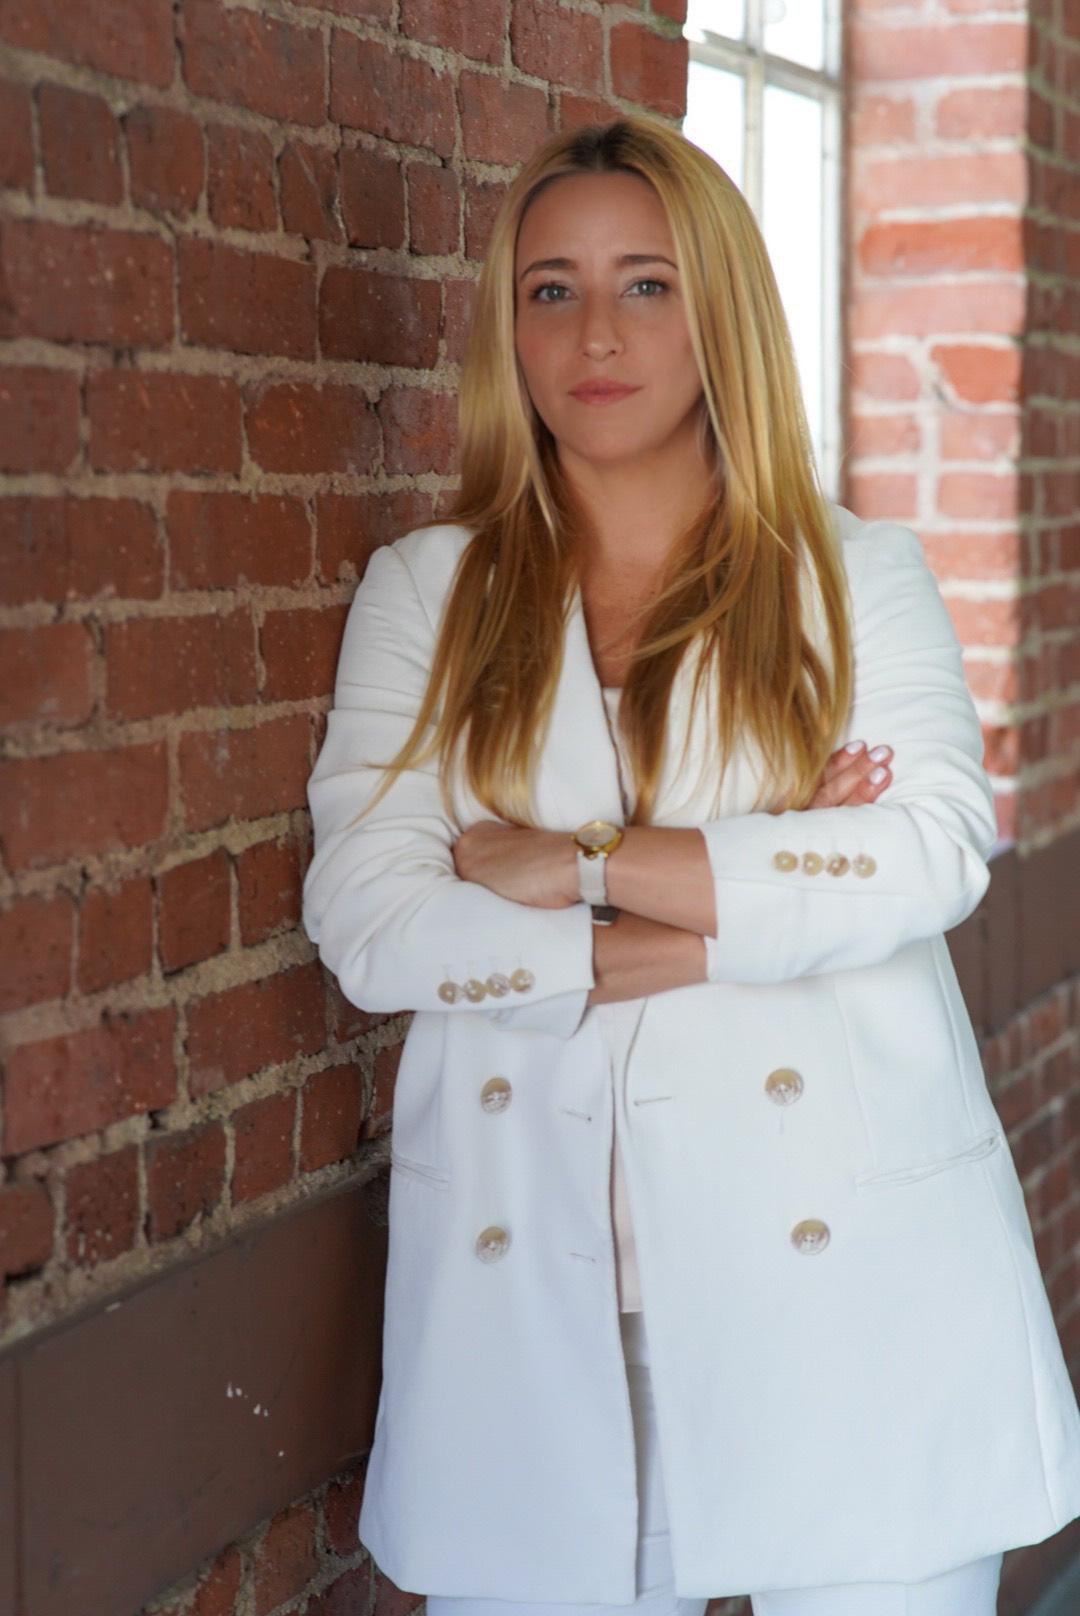 Brandi Kolosky Named One of the Most Inspirational Women